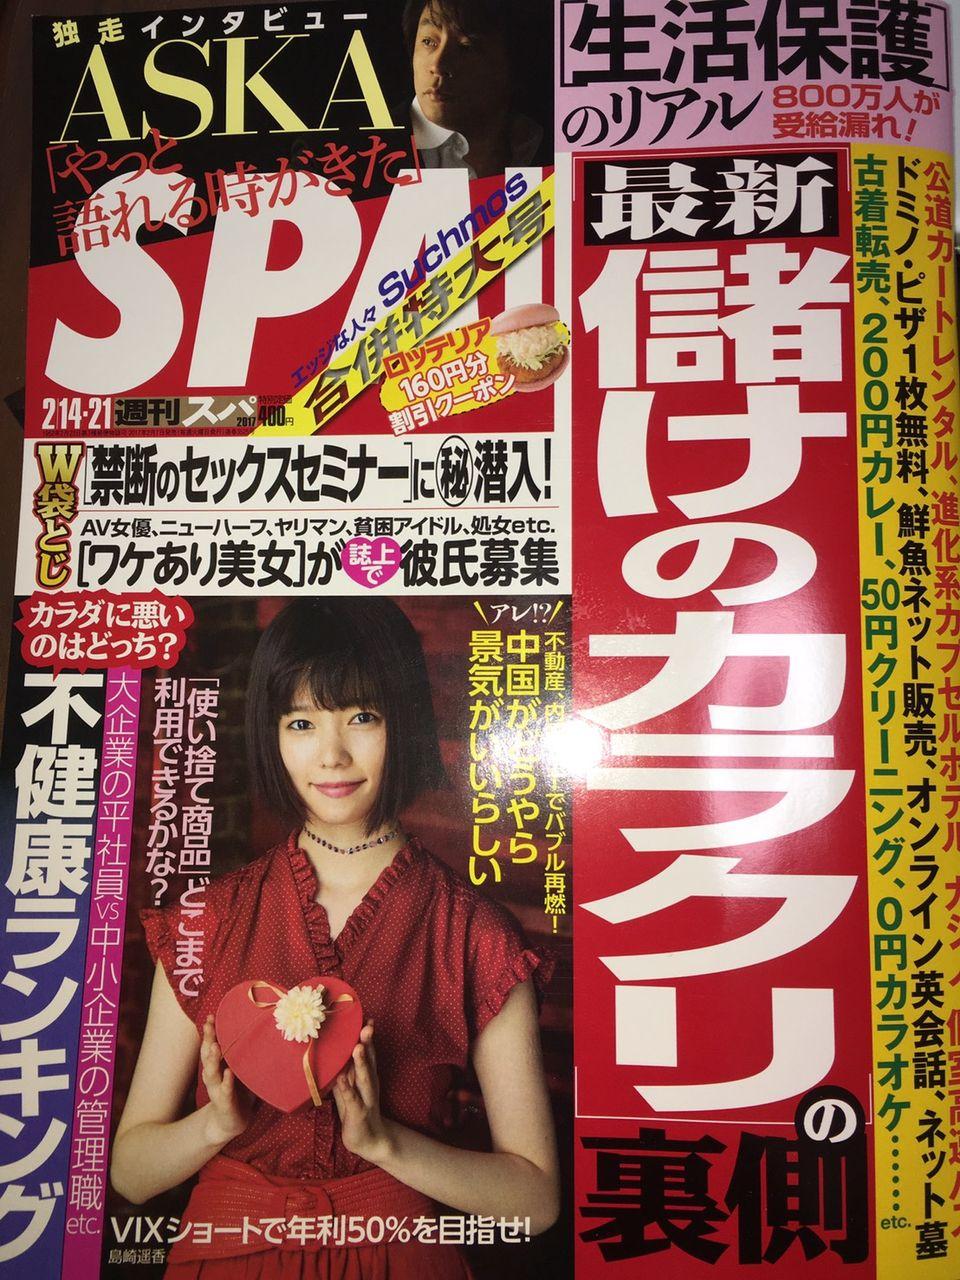 2017年2月7日発売 2/14・2/21合併号「SPA」